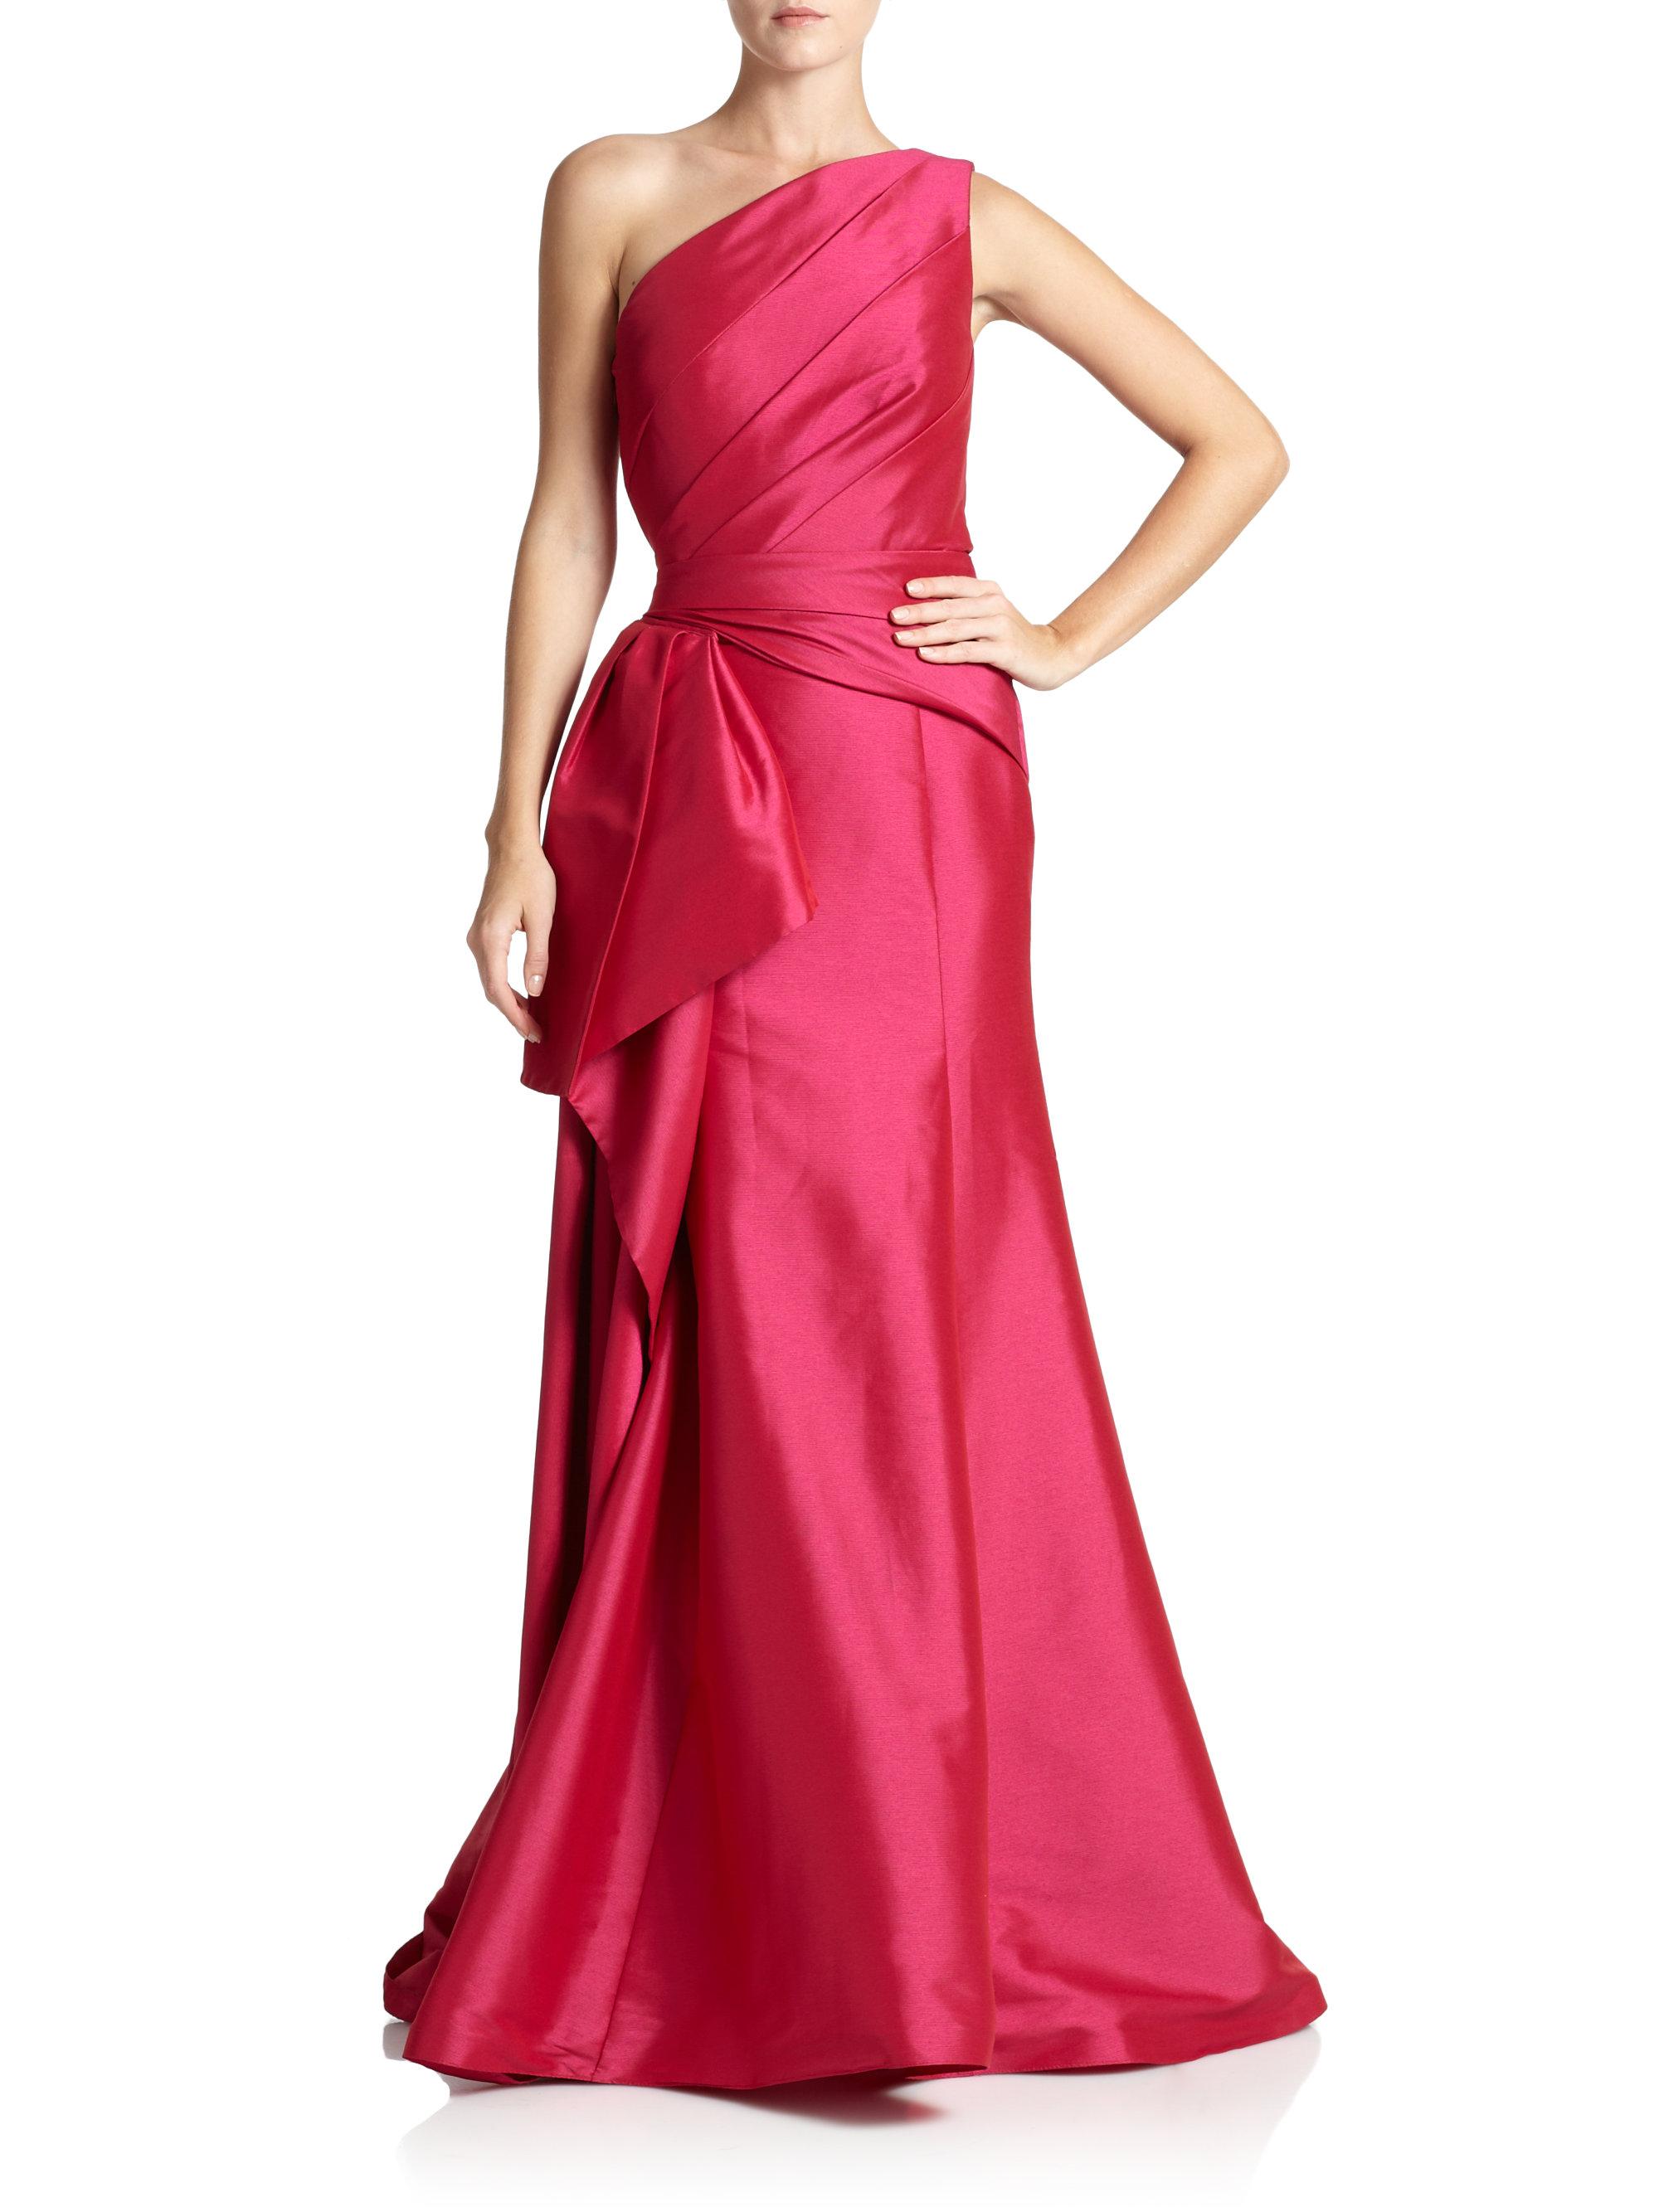 Lyst - Ml Monique Lhuillier Faille Satin One-Shoulder Gown in Pink